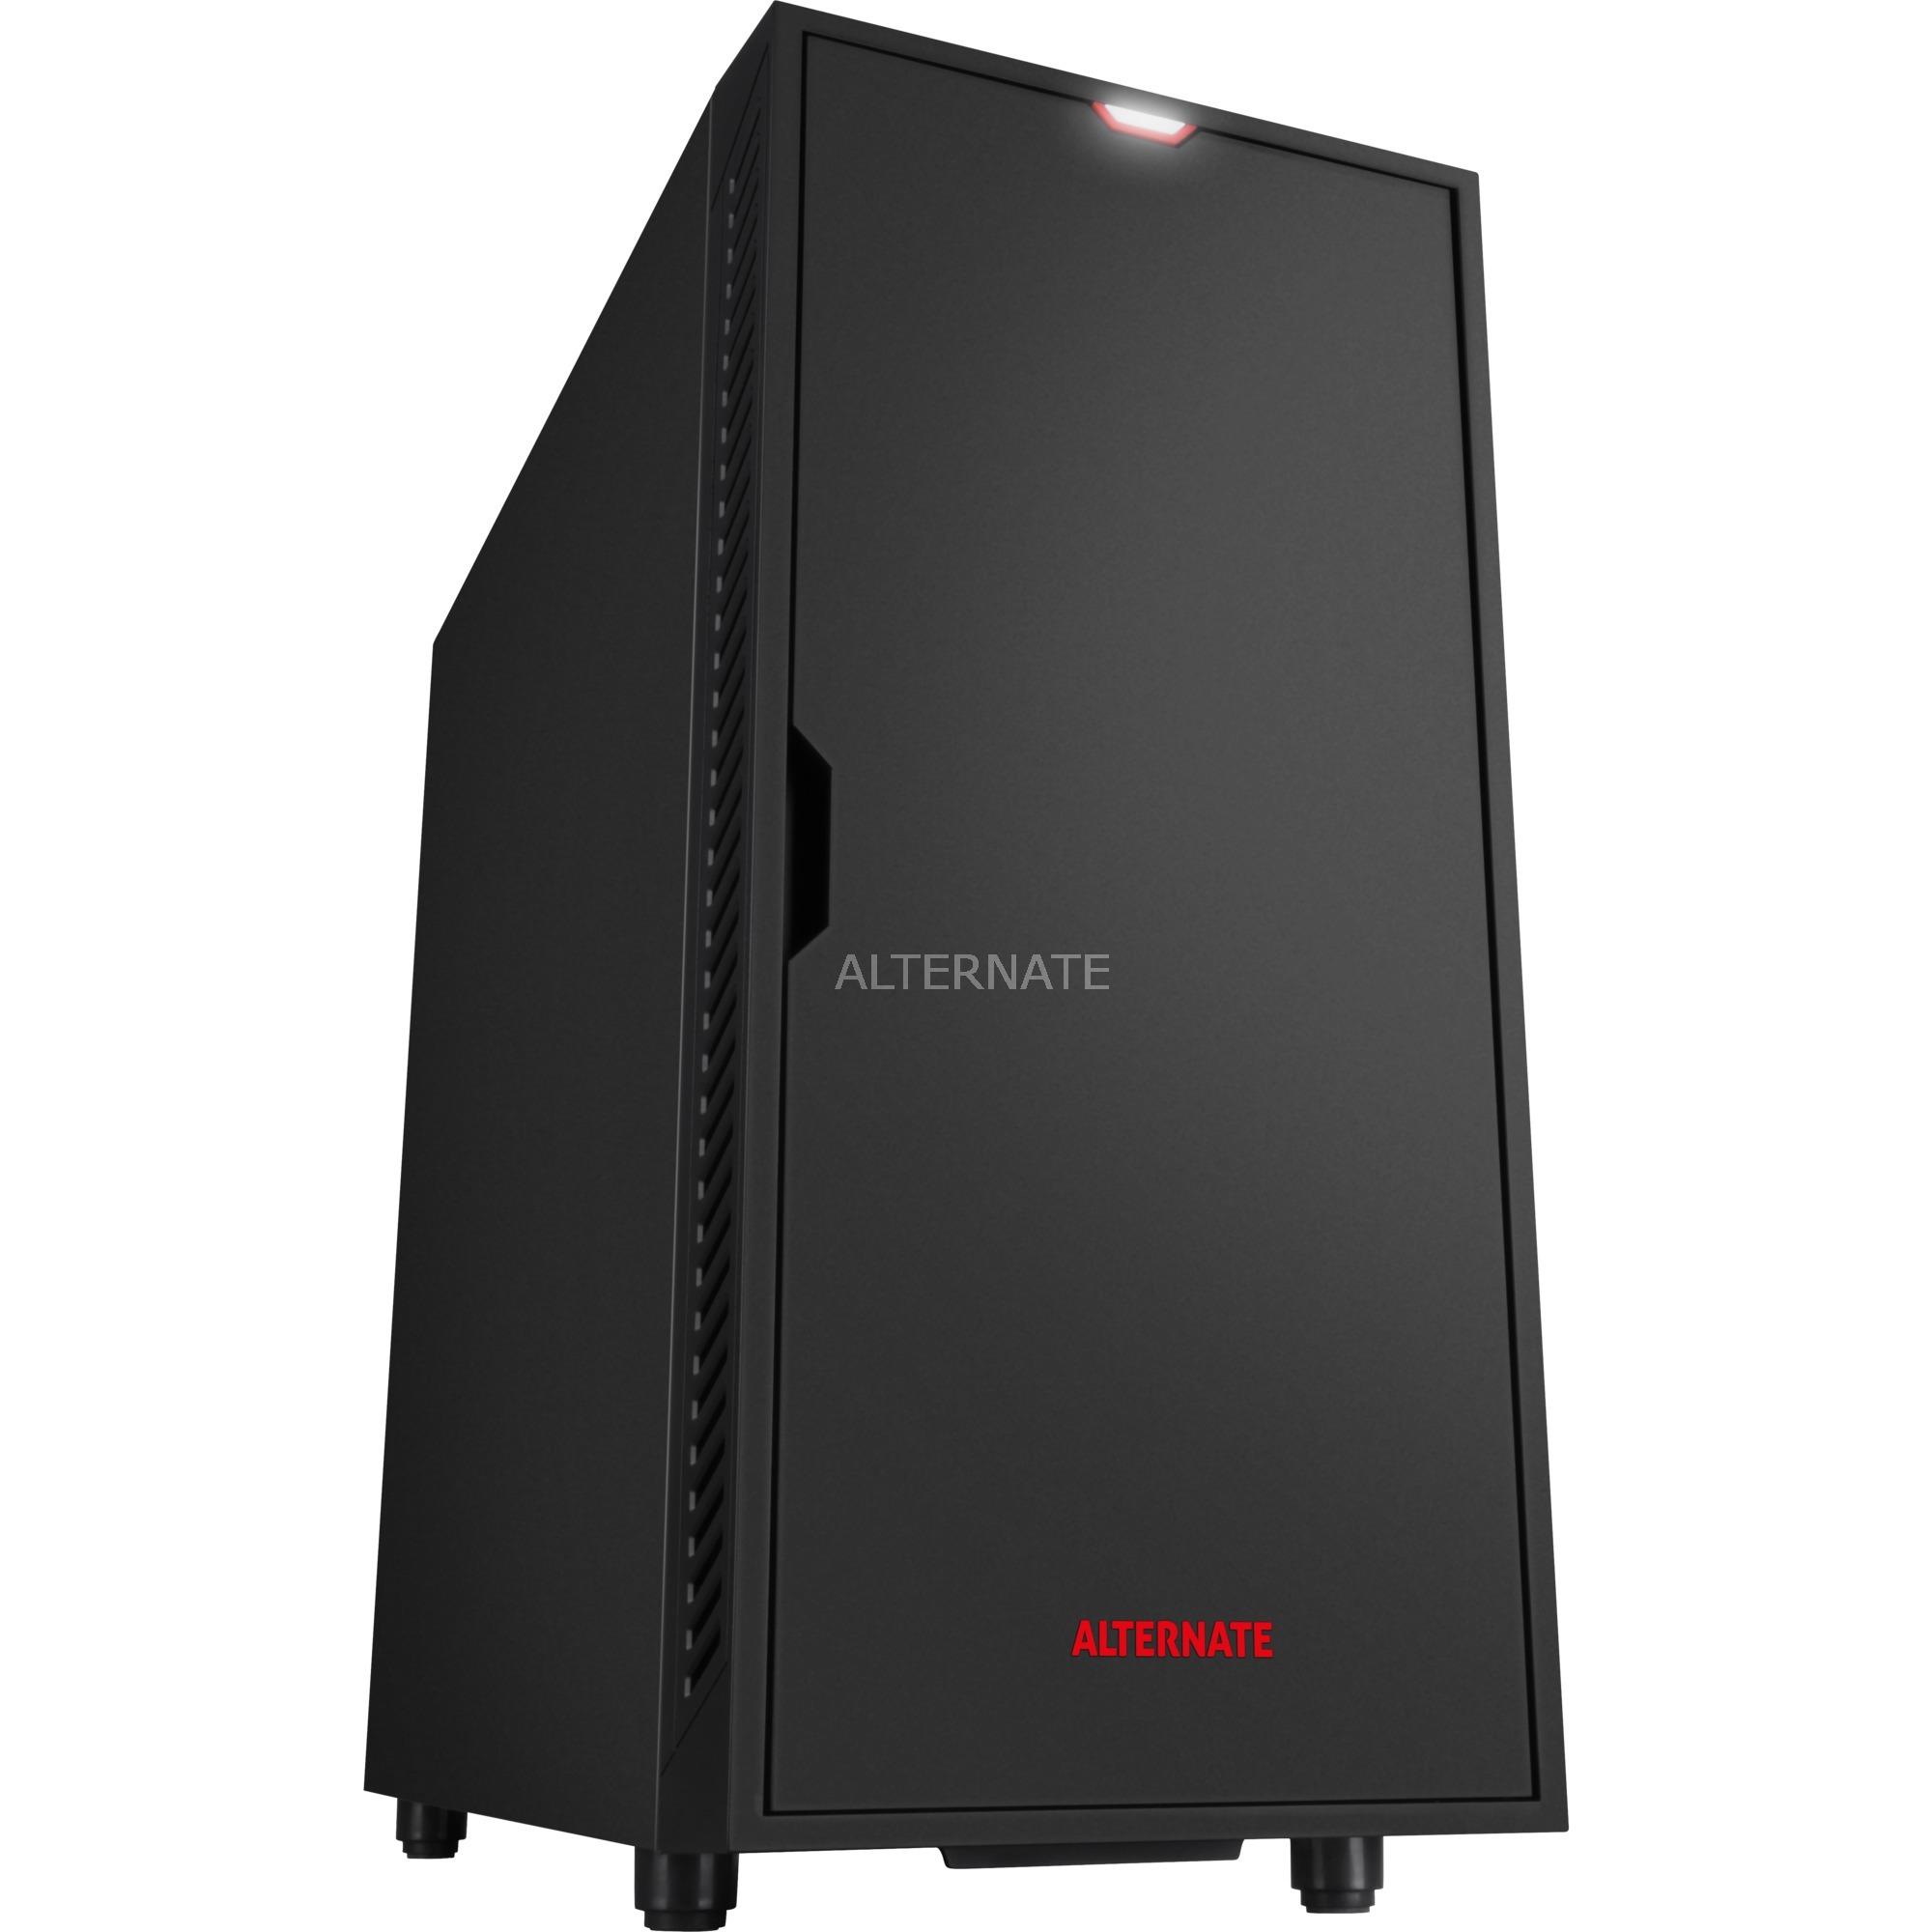 PC AMD GAMER V3, PC completo